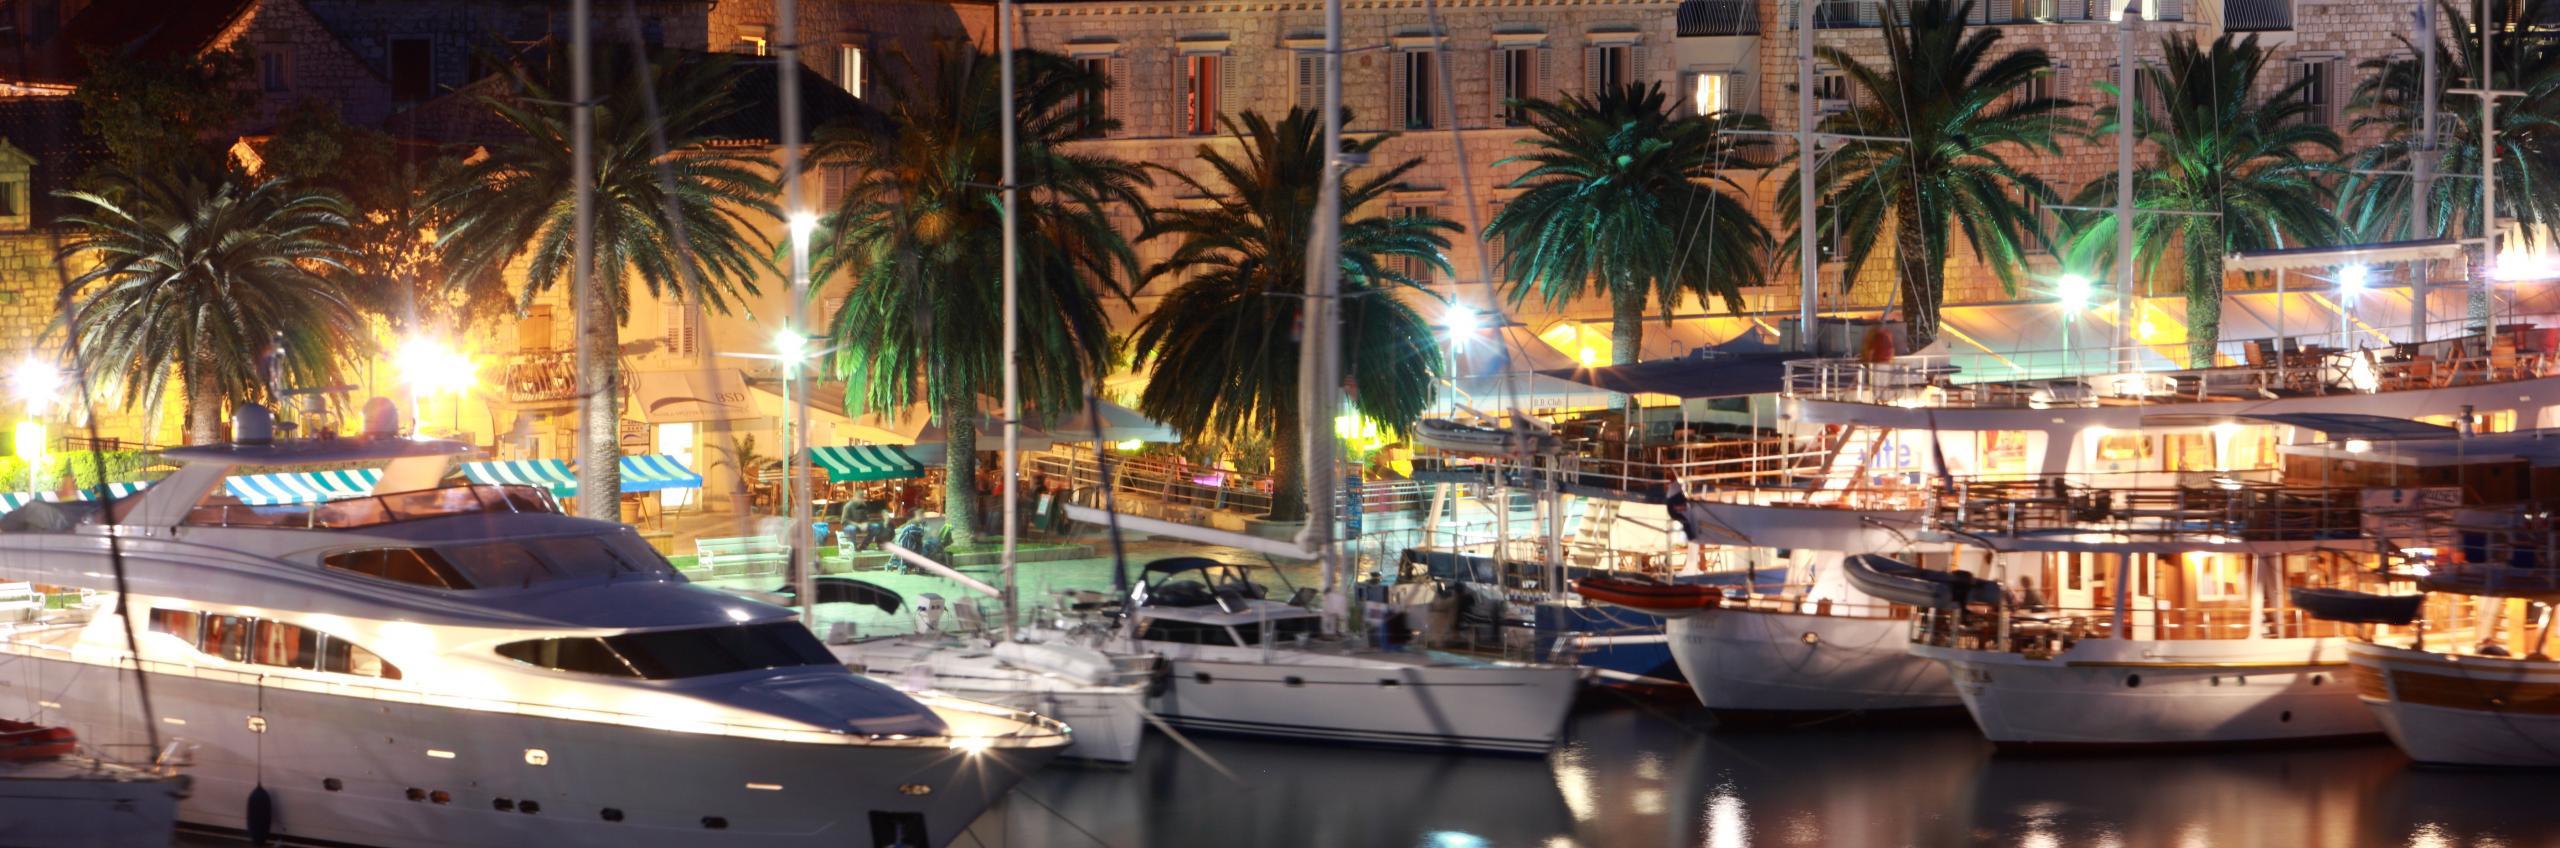 Riva, hvar yacht harbour hotel